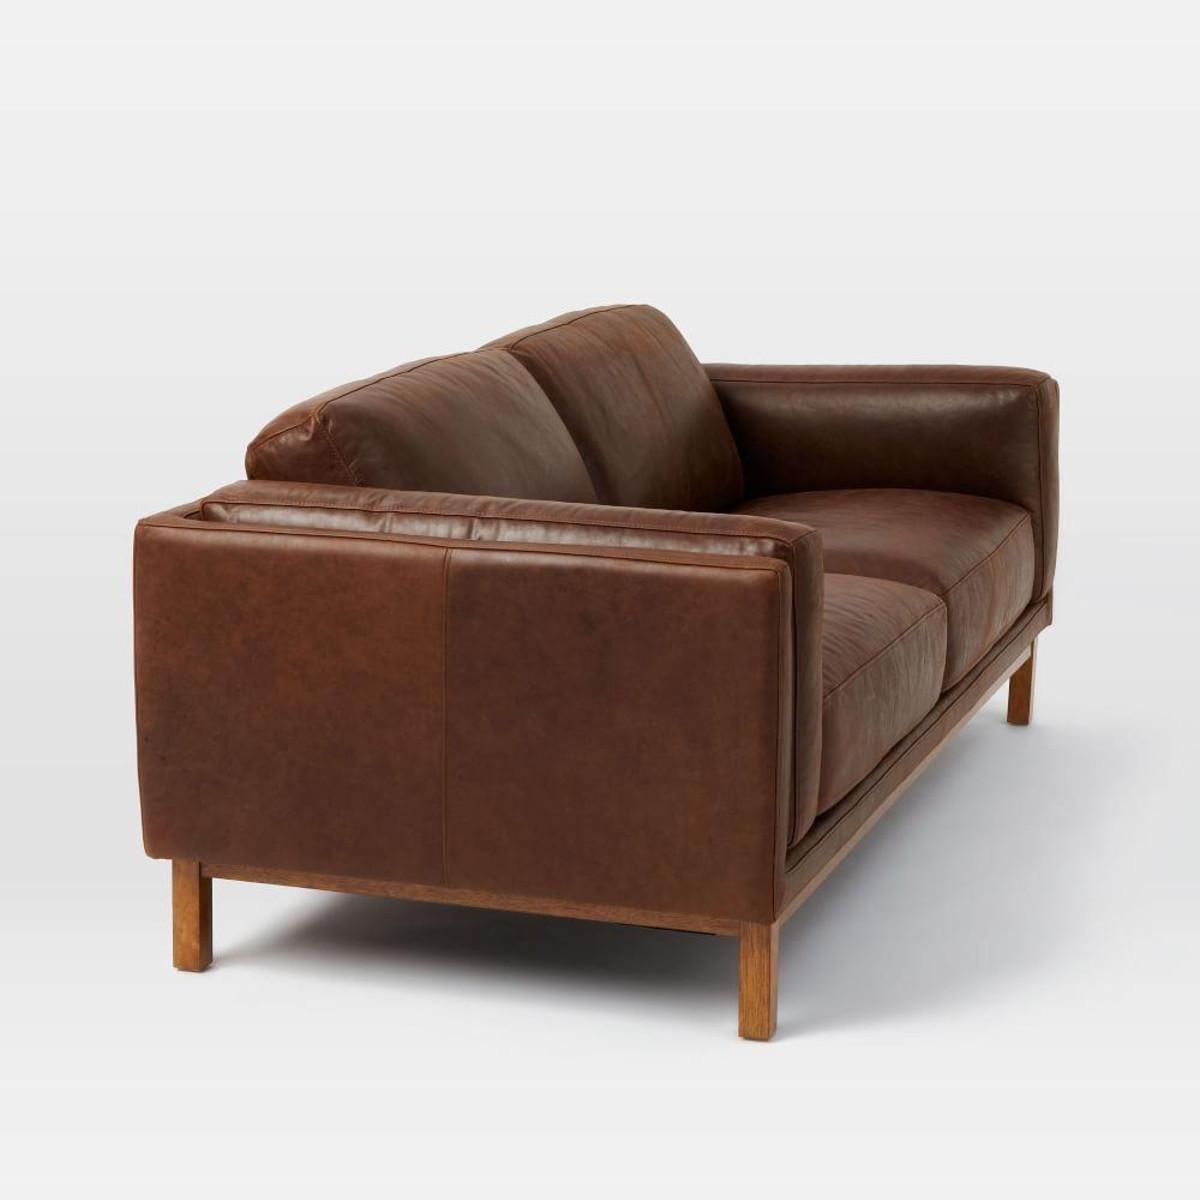 Aniline Leather Sofas John Lewis Halo Groucho Small Aniline Throughout Aniline Leather Sofas (View 13 of 20)